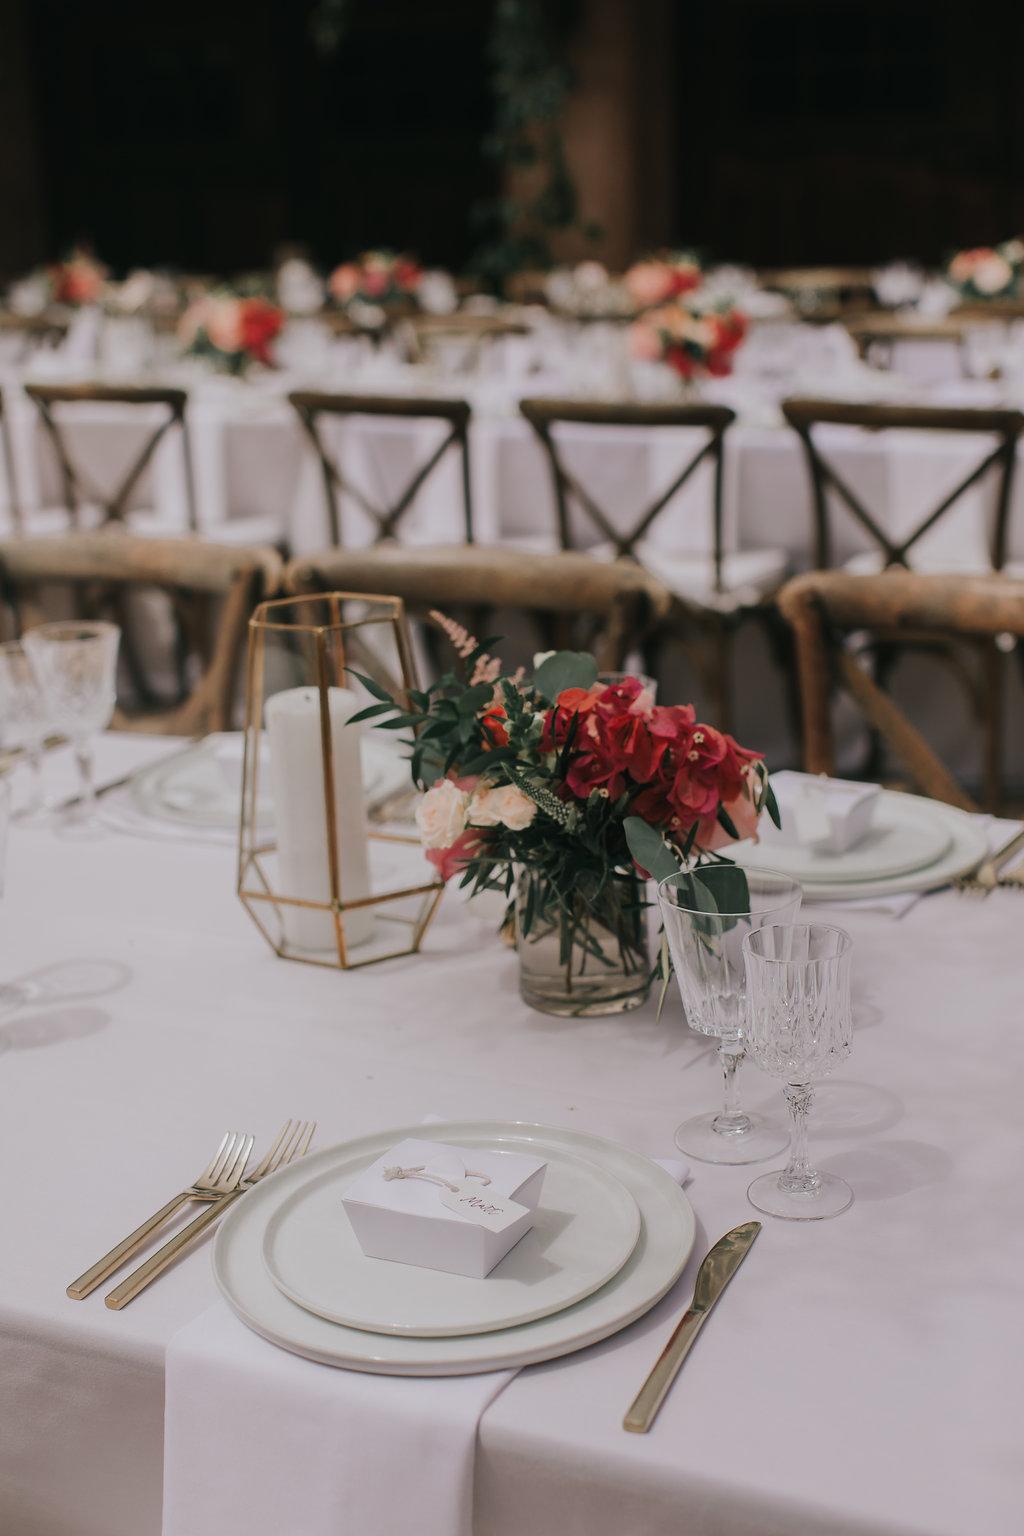 elle-brandon-santa-barbara-california-kindred-weddings-306.jpg